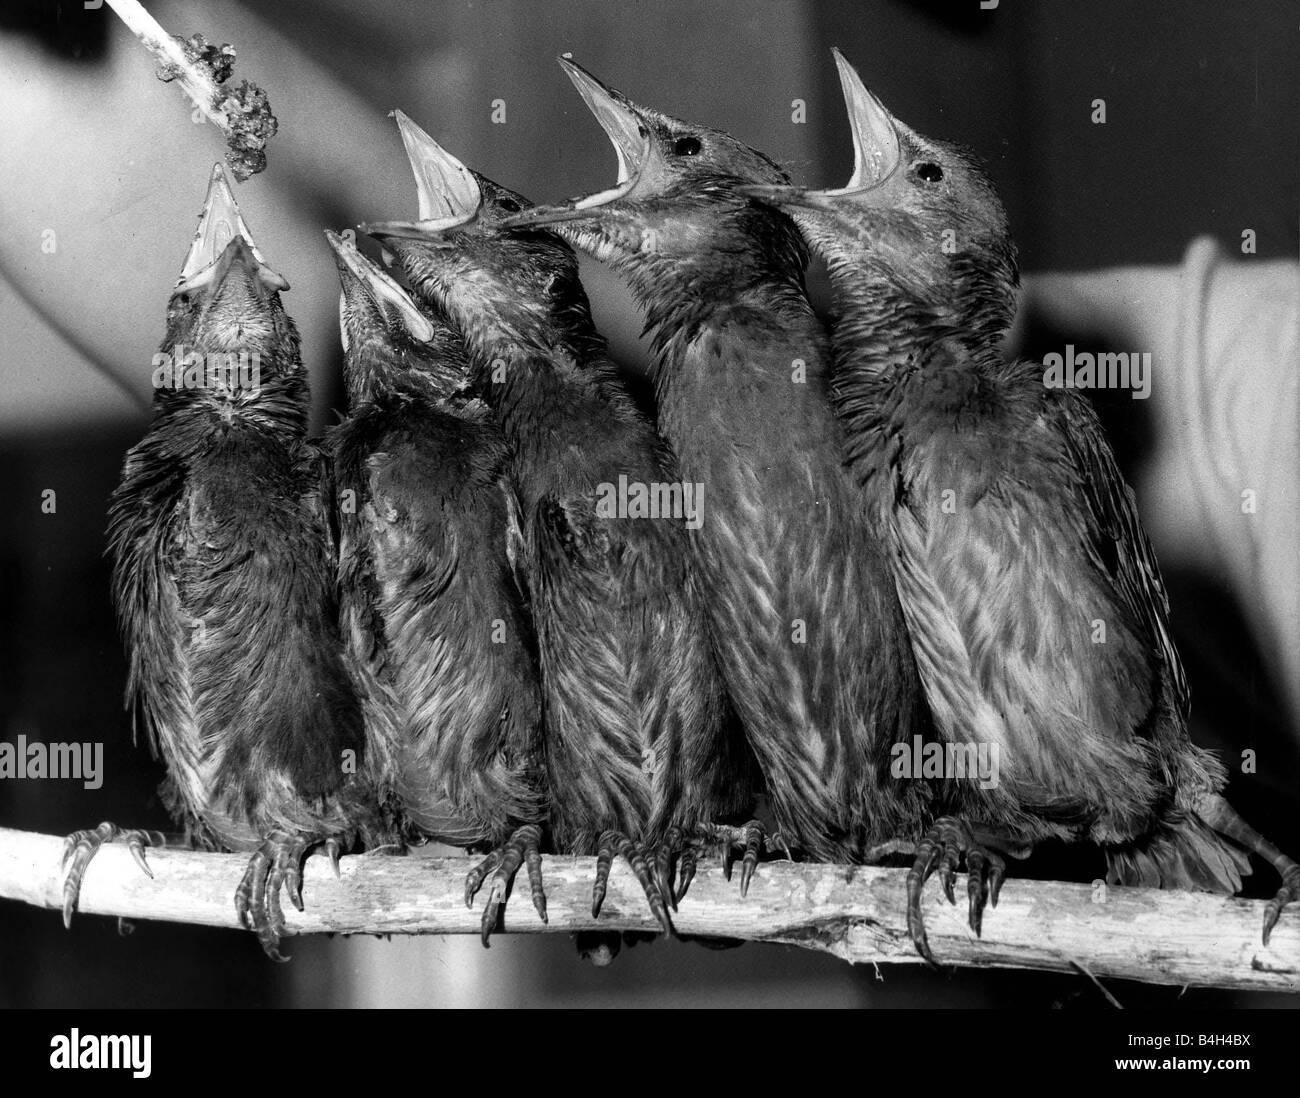 Animal Birds May 1985 - Stock Image